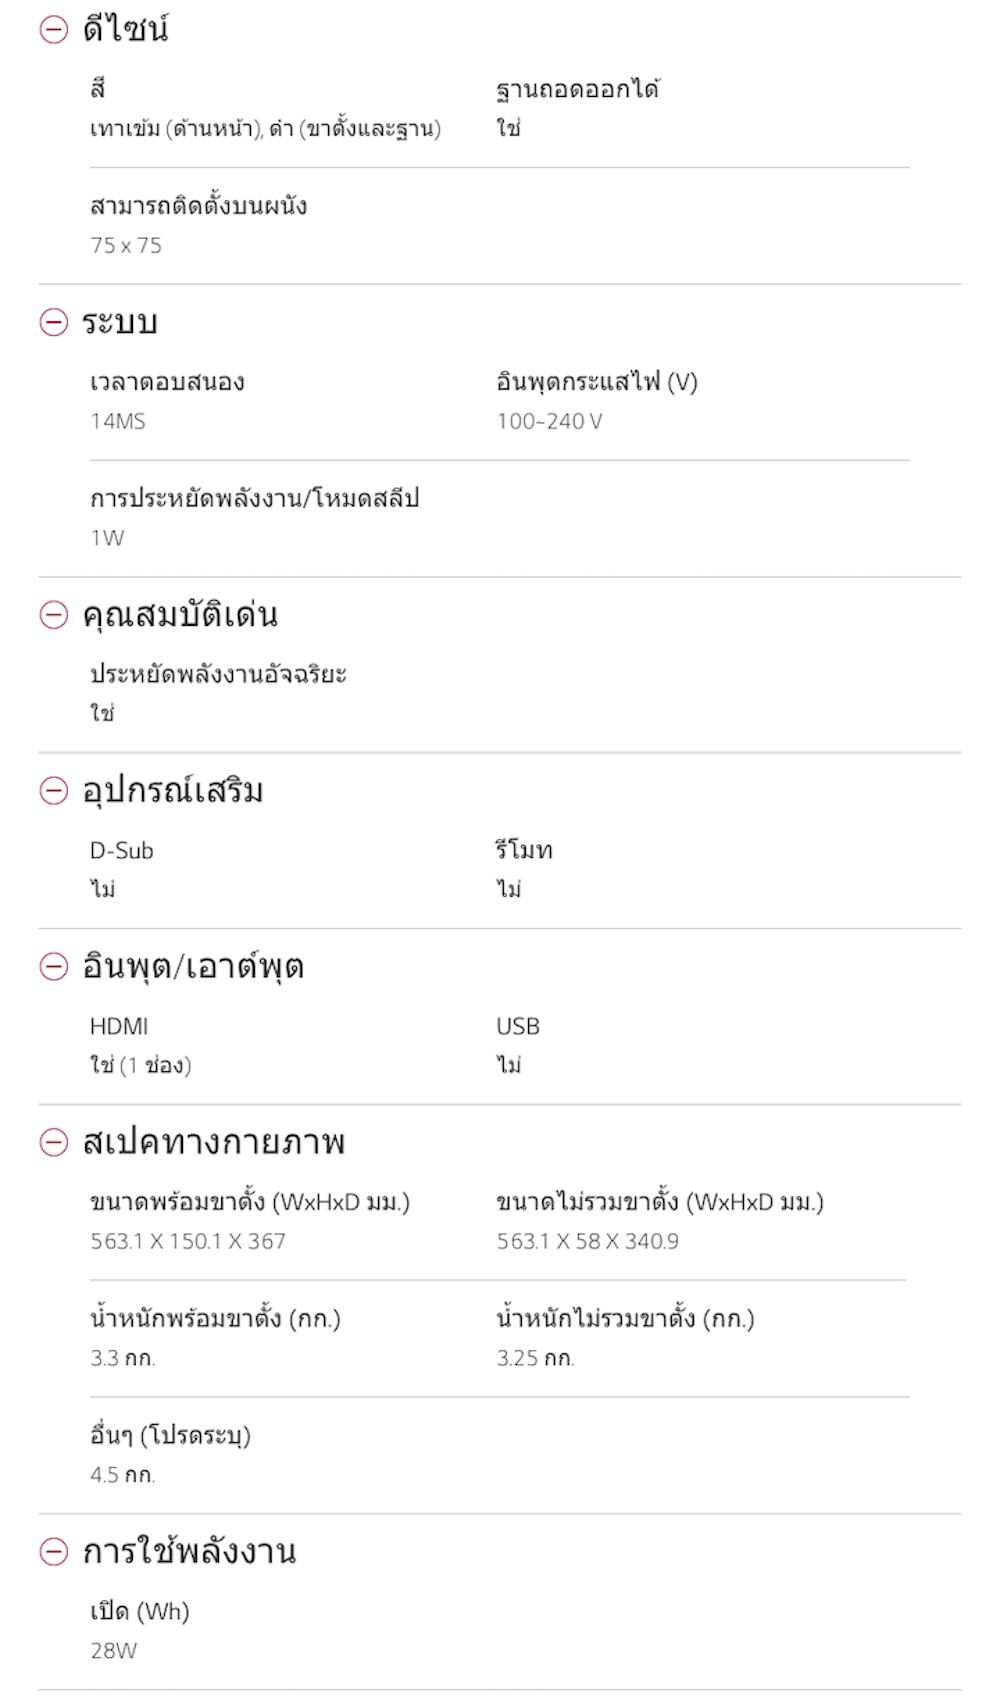 10-content-lgtvmonitor24tl520v-pt.png